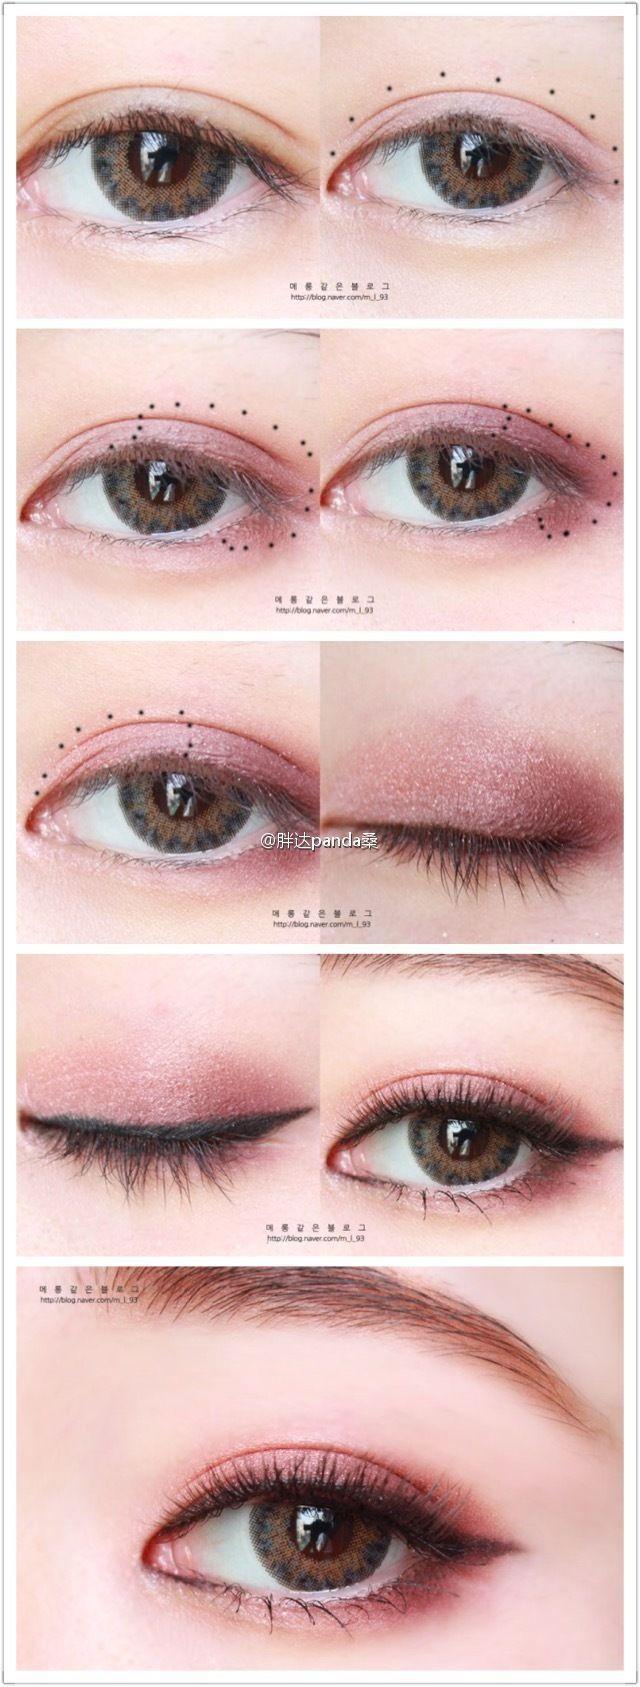 Asian Eye Makeup Koreaneyemakeup Passo A Passo Pinterest